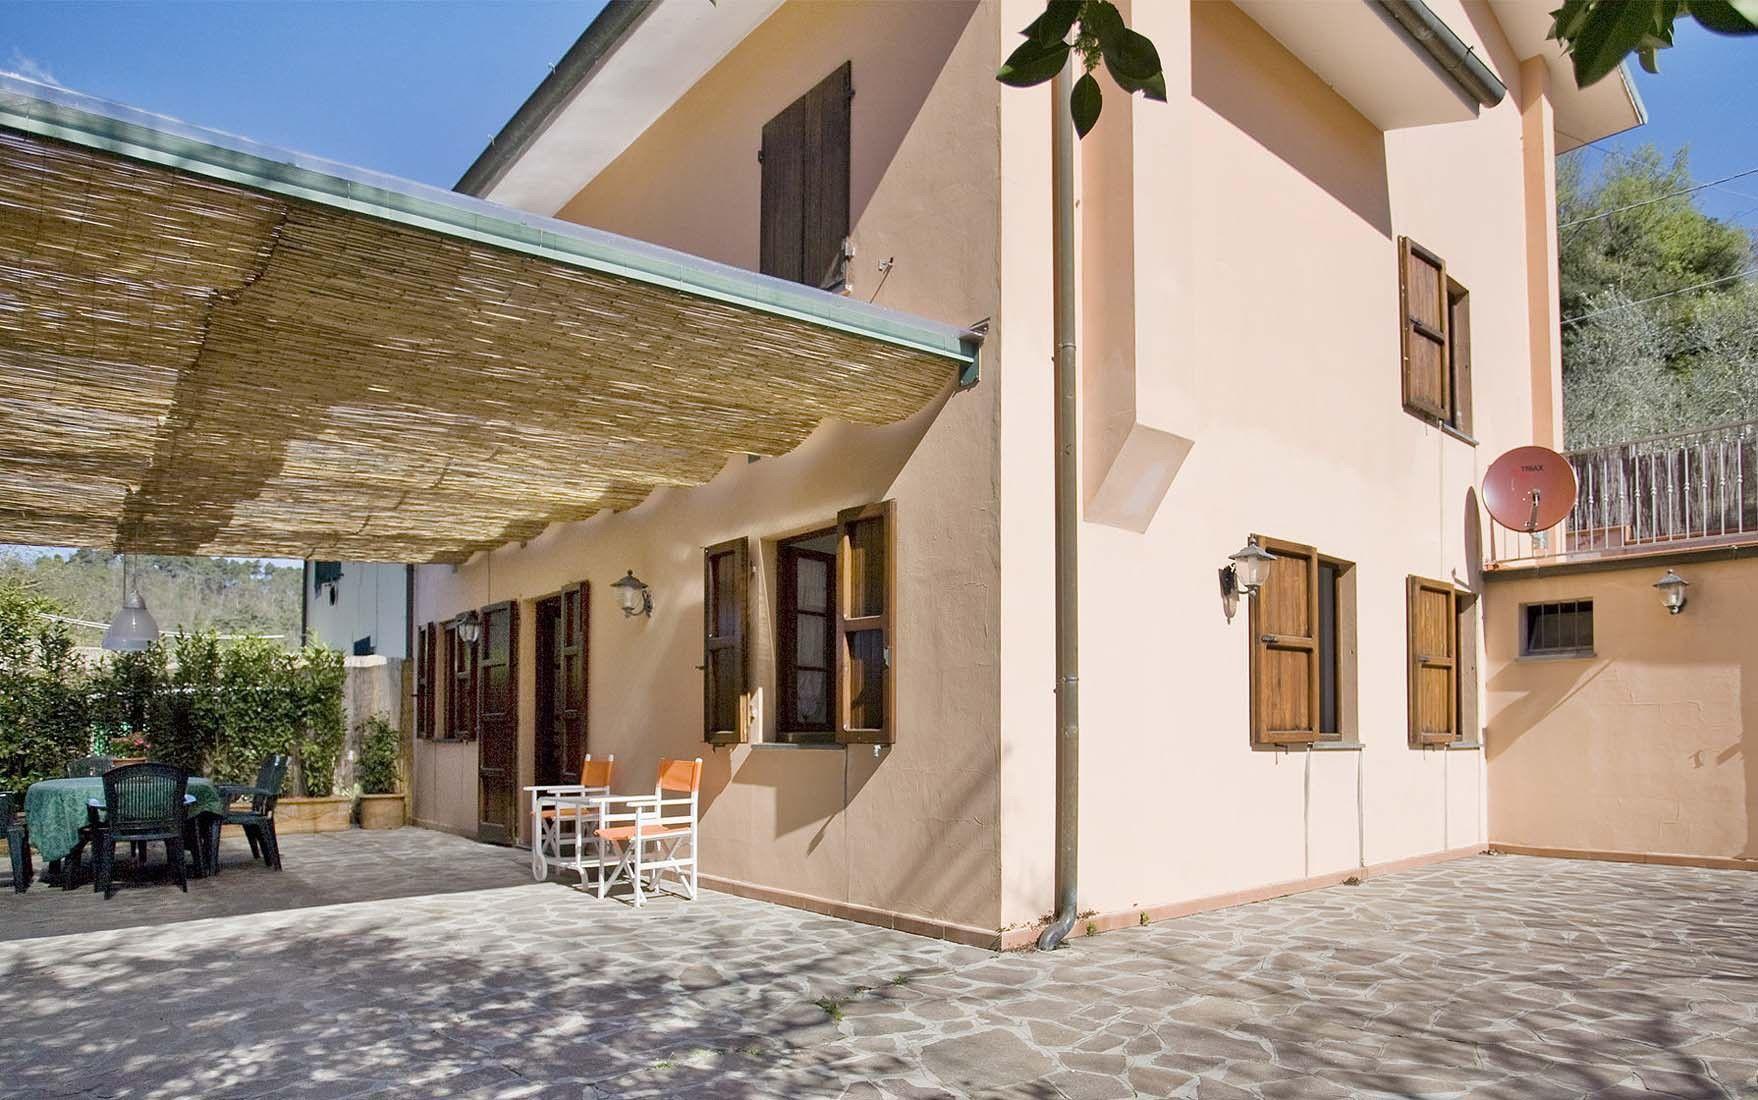 Rent a house in Camaiore near the sea